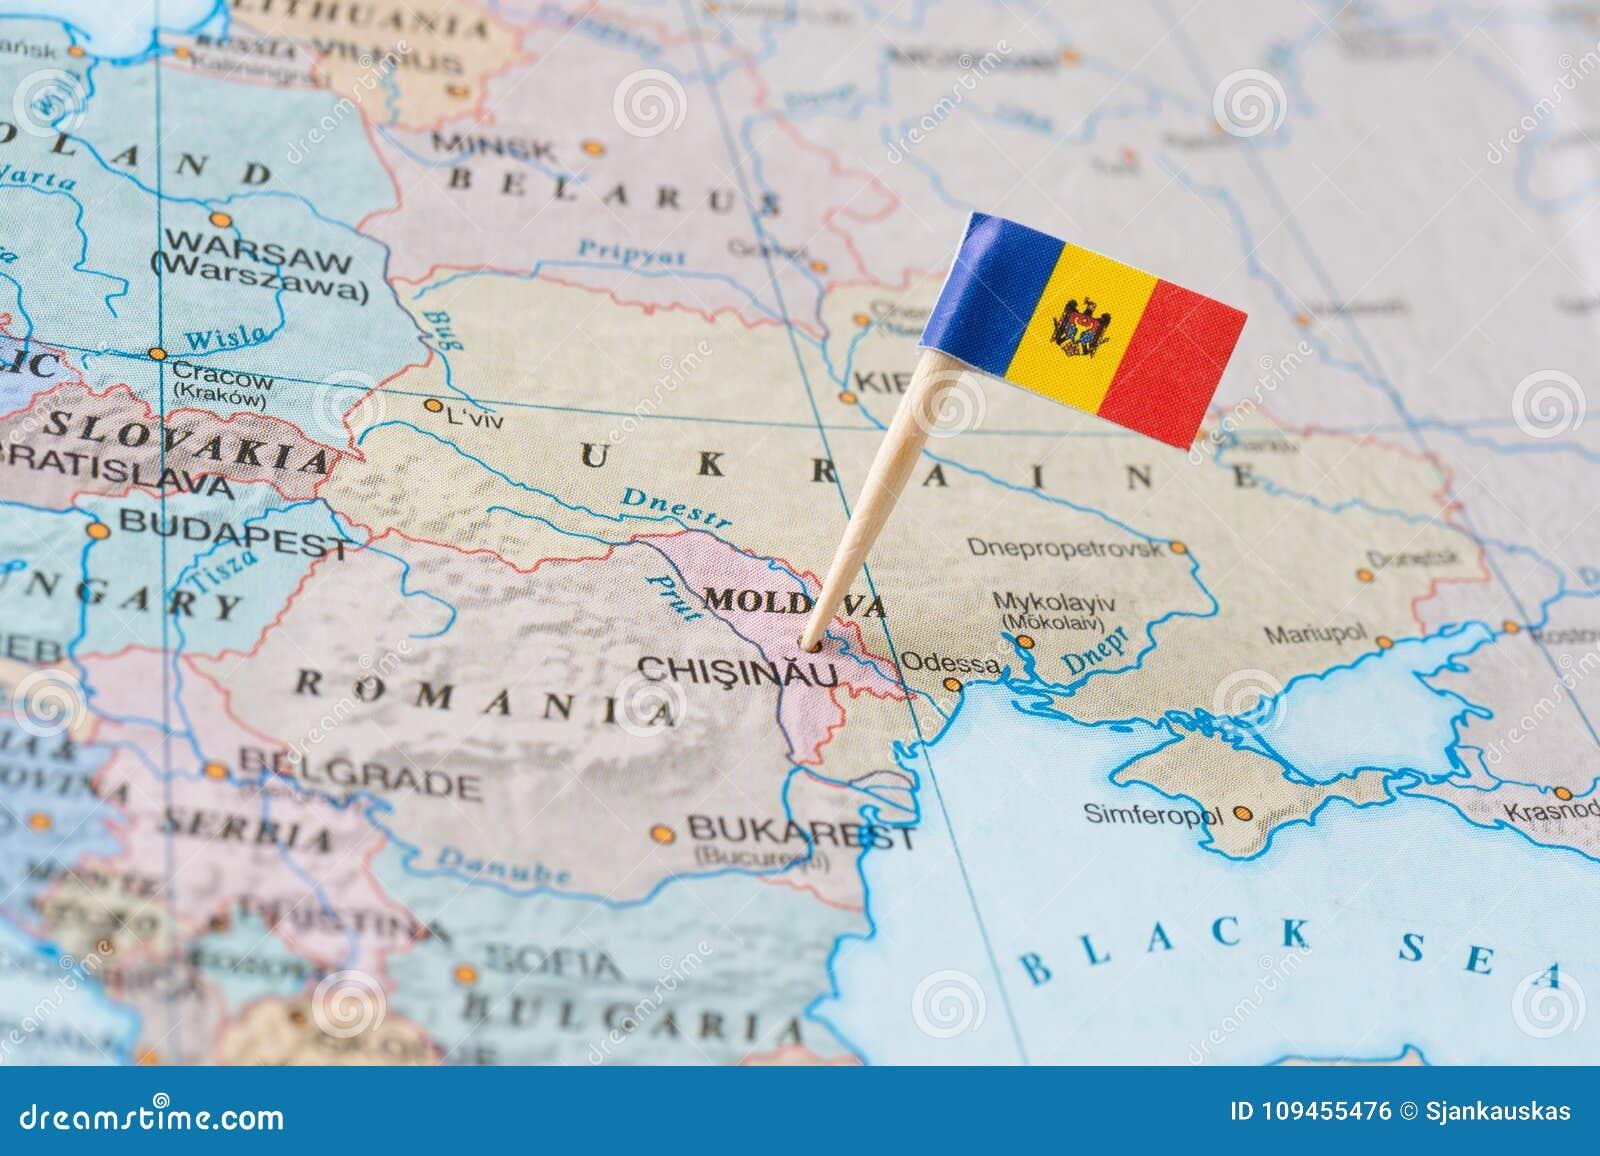 Moldova map and flag pin stock photo  Image of mark - 109455476